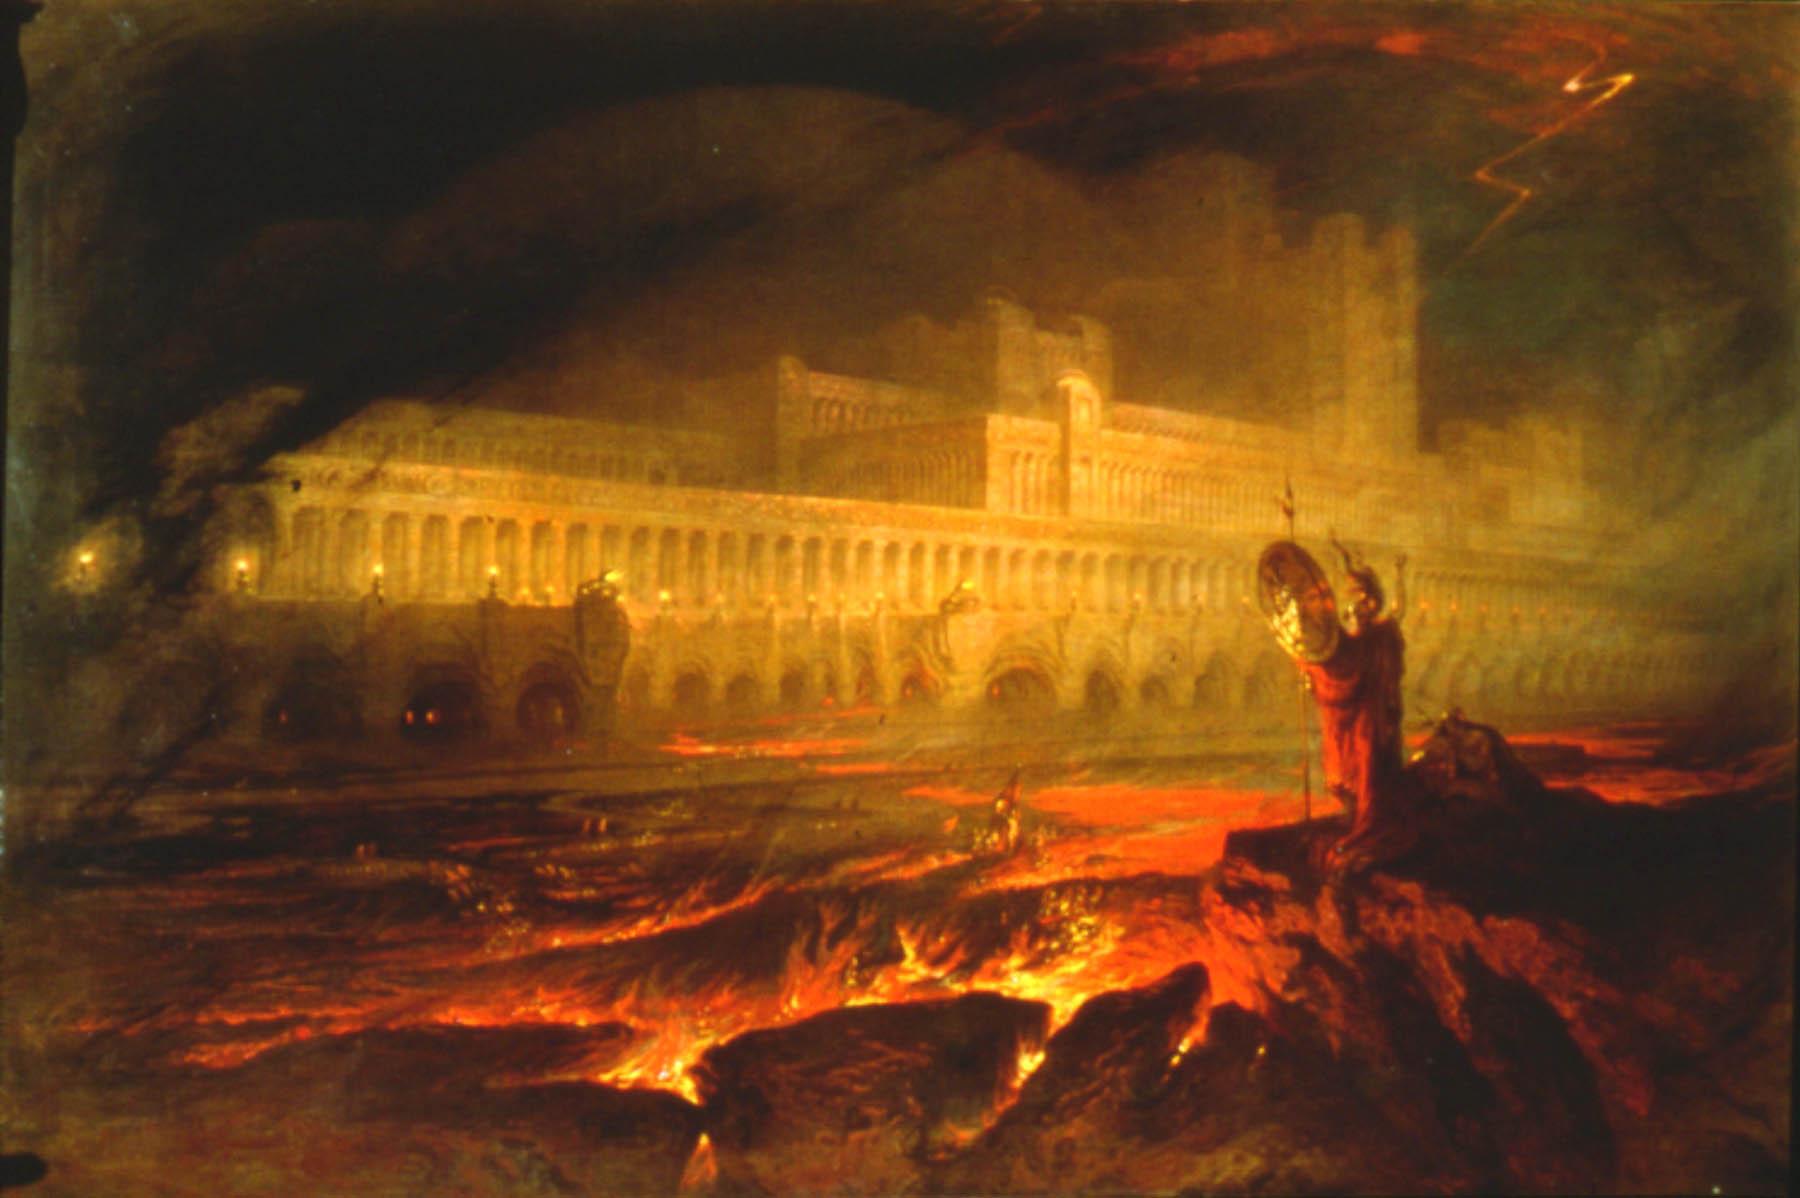 The Kingdom of Darkness